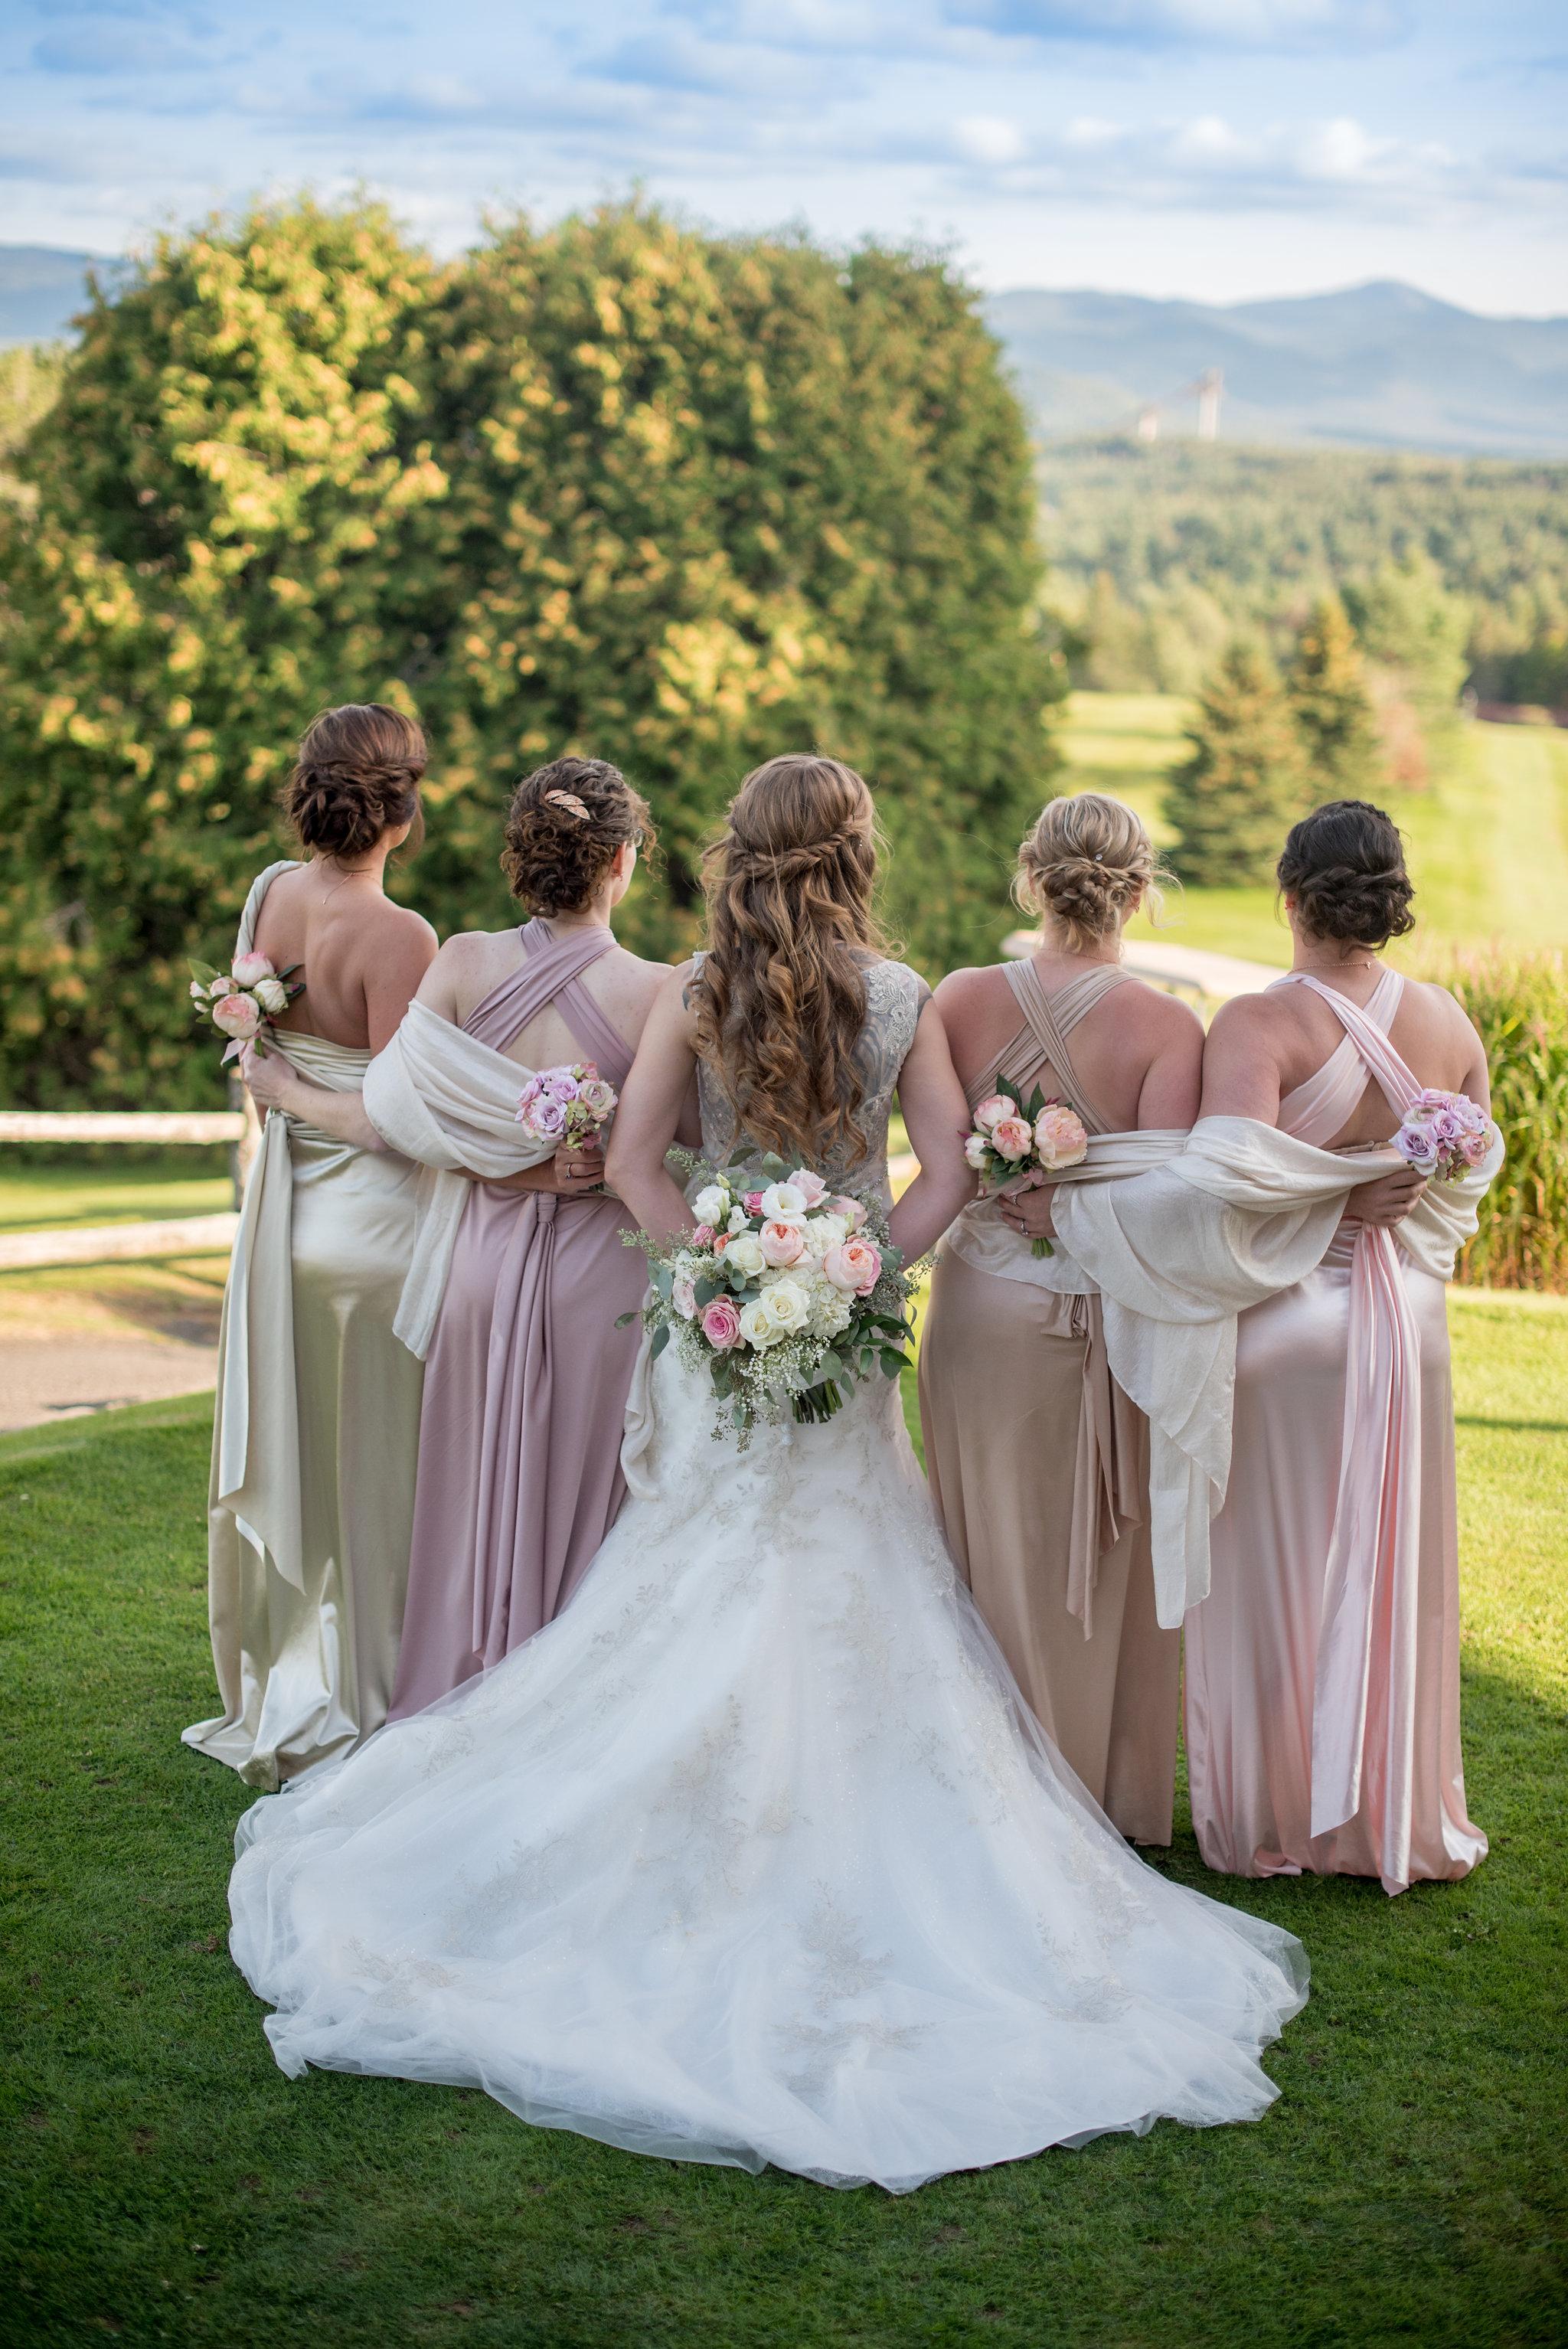 vermont-wedding-photographer-sarah-annay-photography.jpg2.jpg